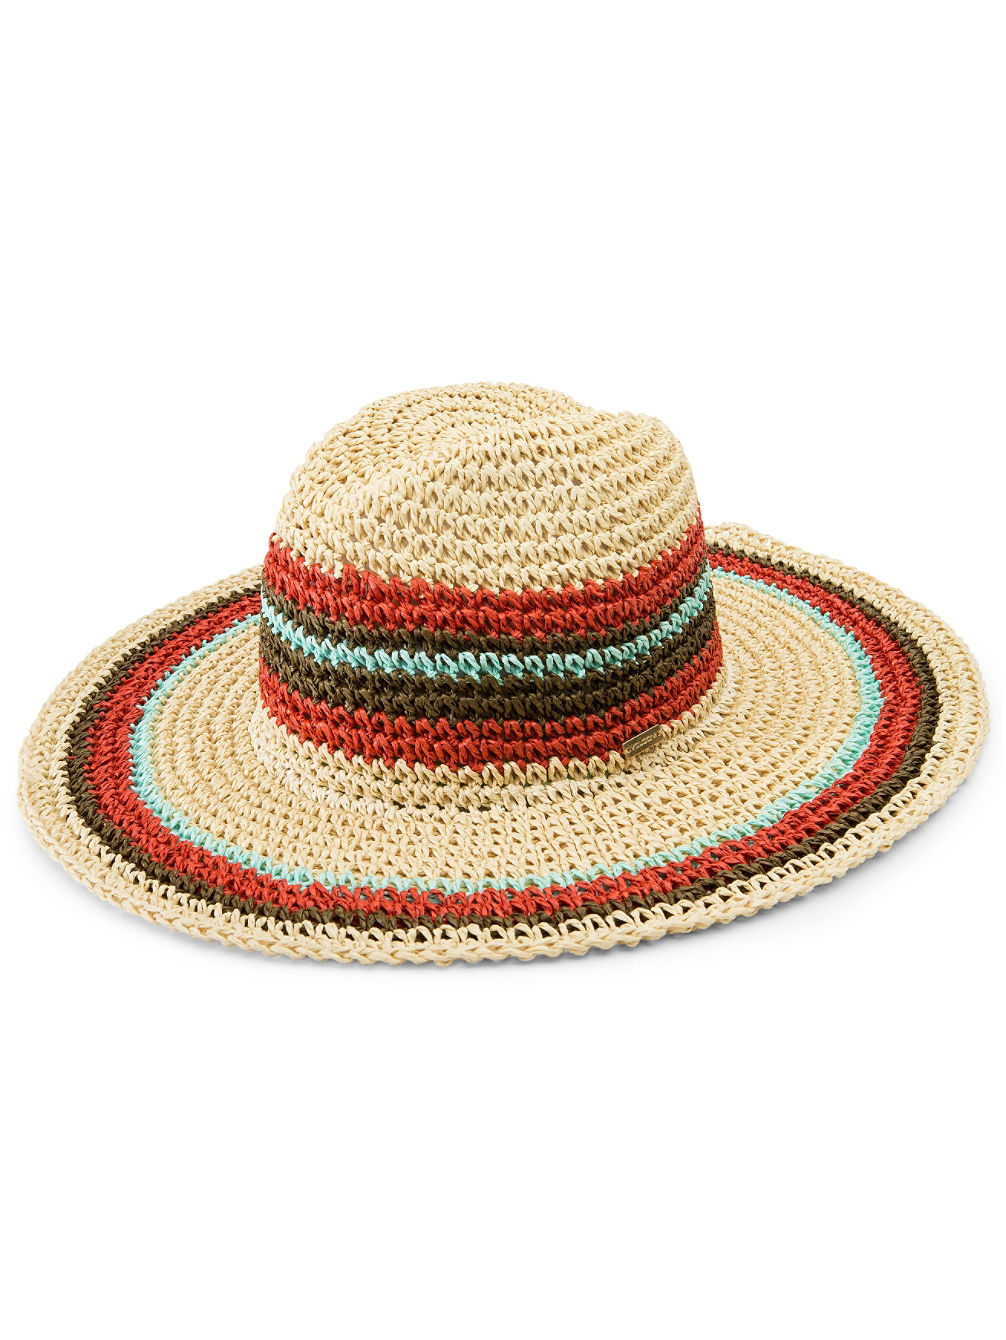 volcom-raya-straw-hat